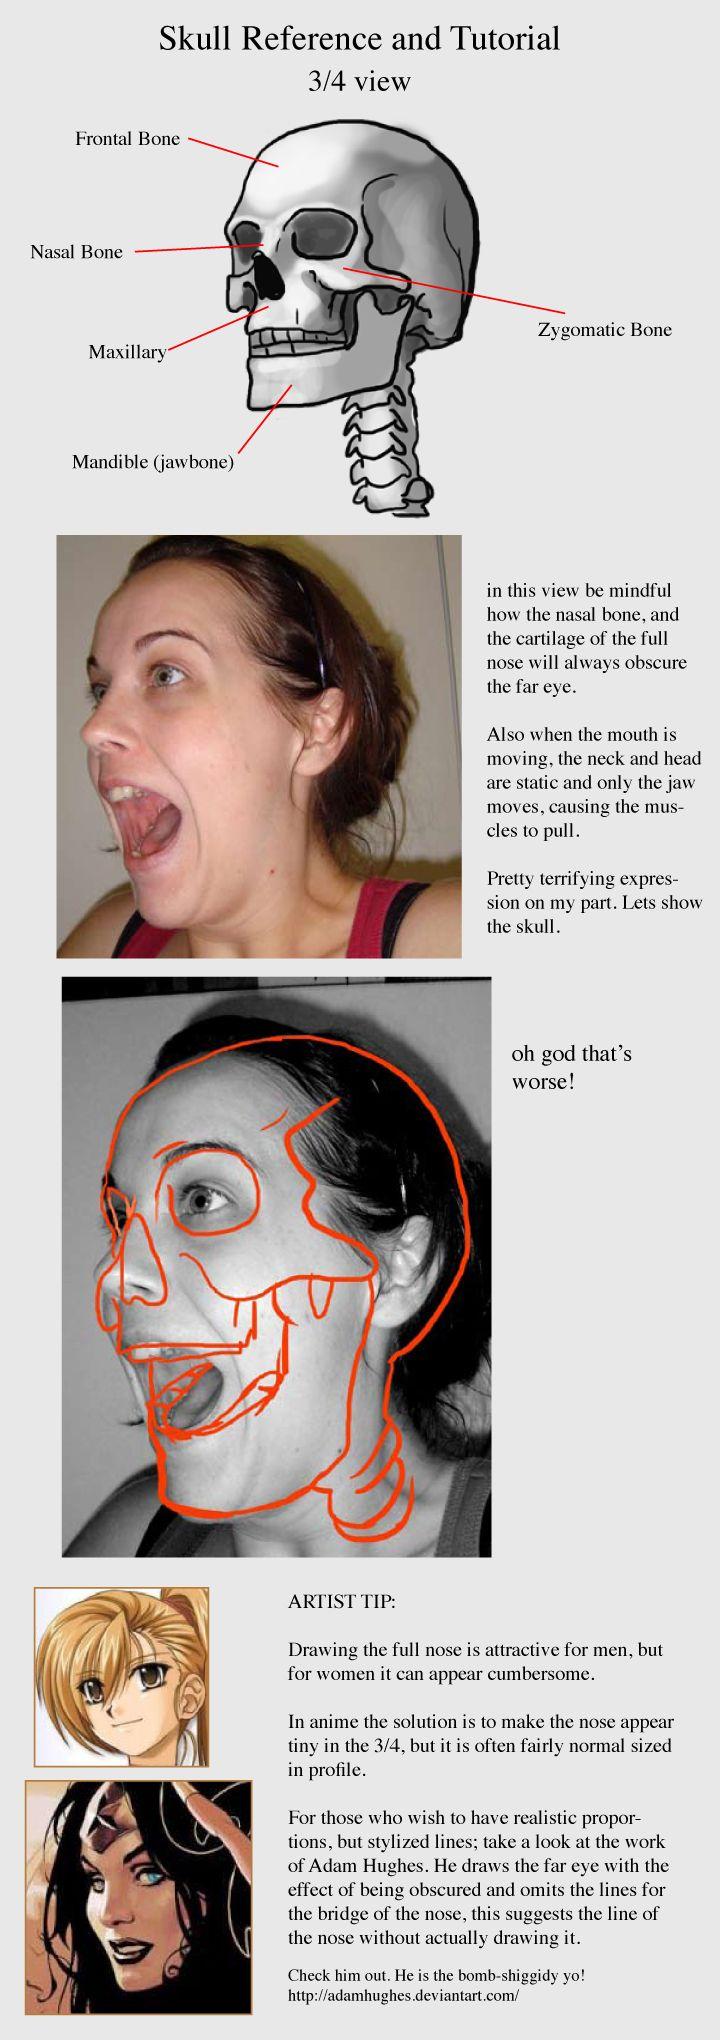 skull_reference_and_tut_3.jpg